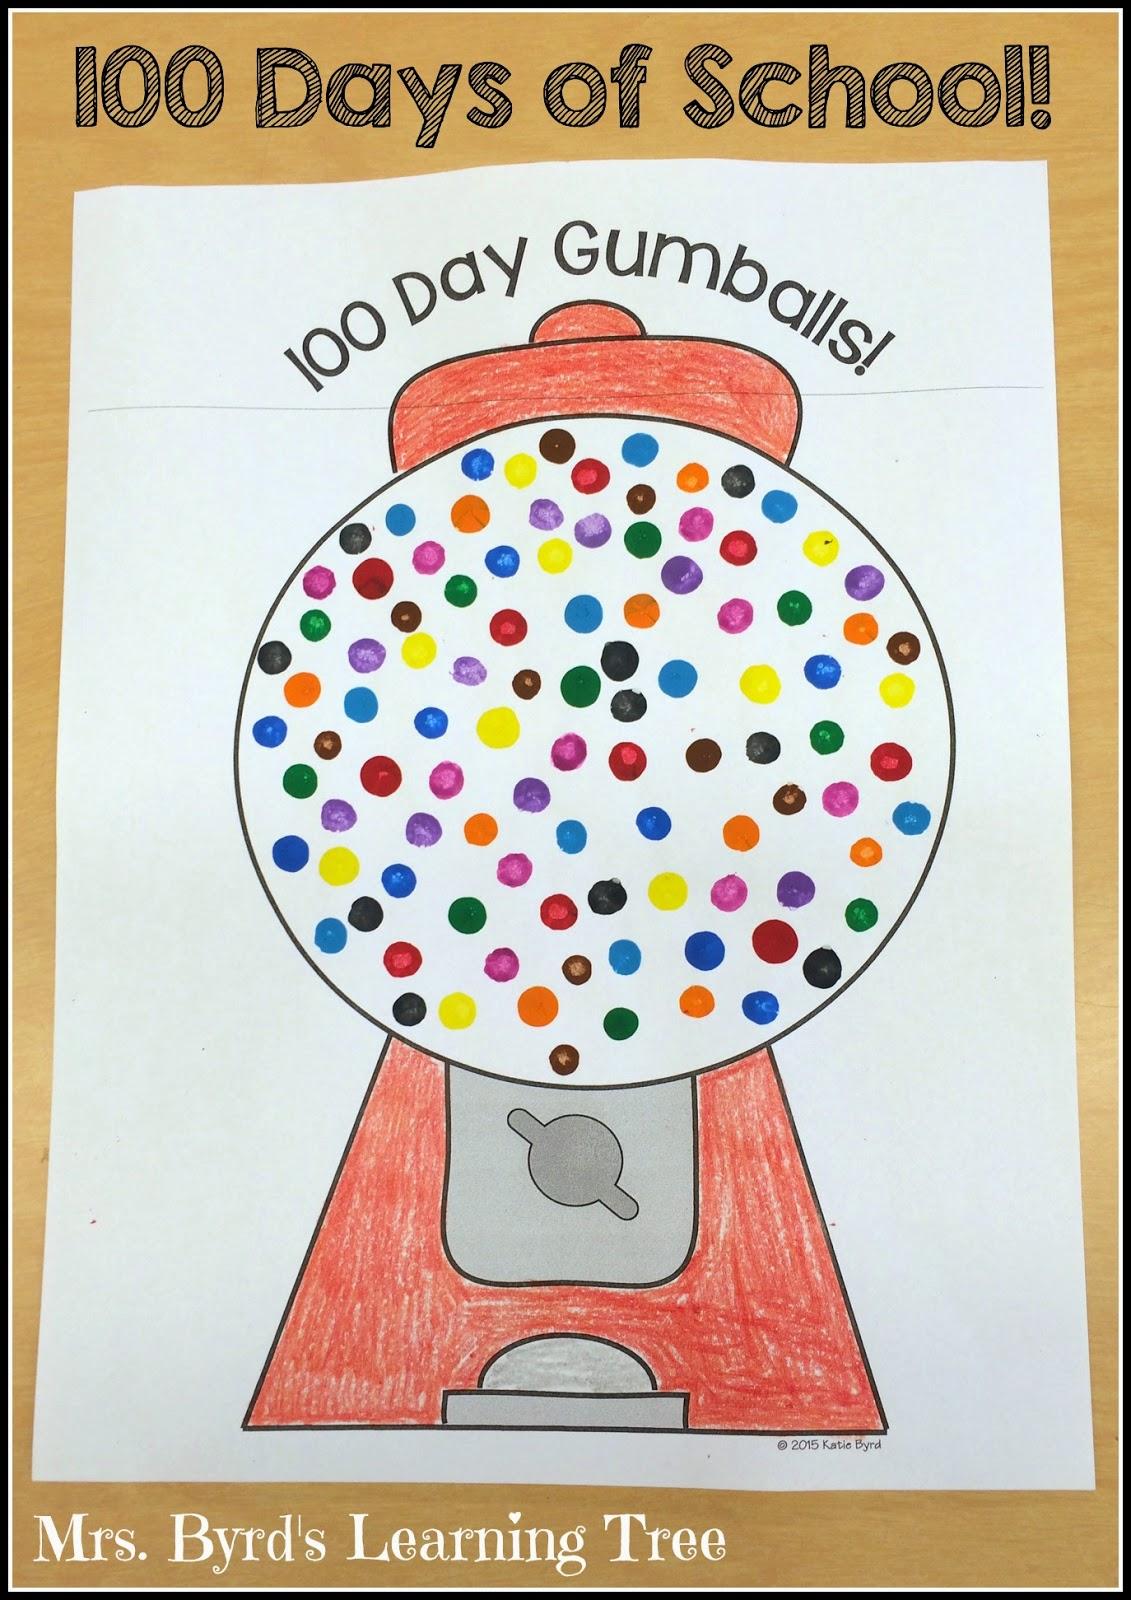 math worksheet : a bountiful love 30 ways to celebrate 100 days of school : 100 Days Of School Worksheets For Kindergarten